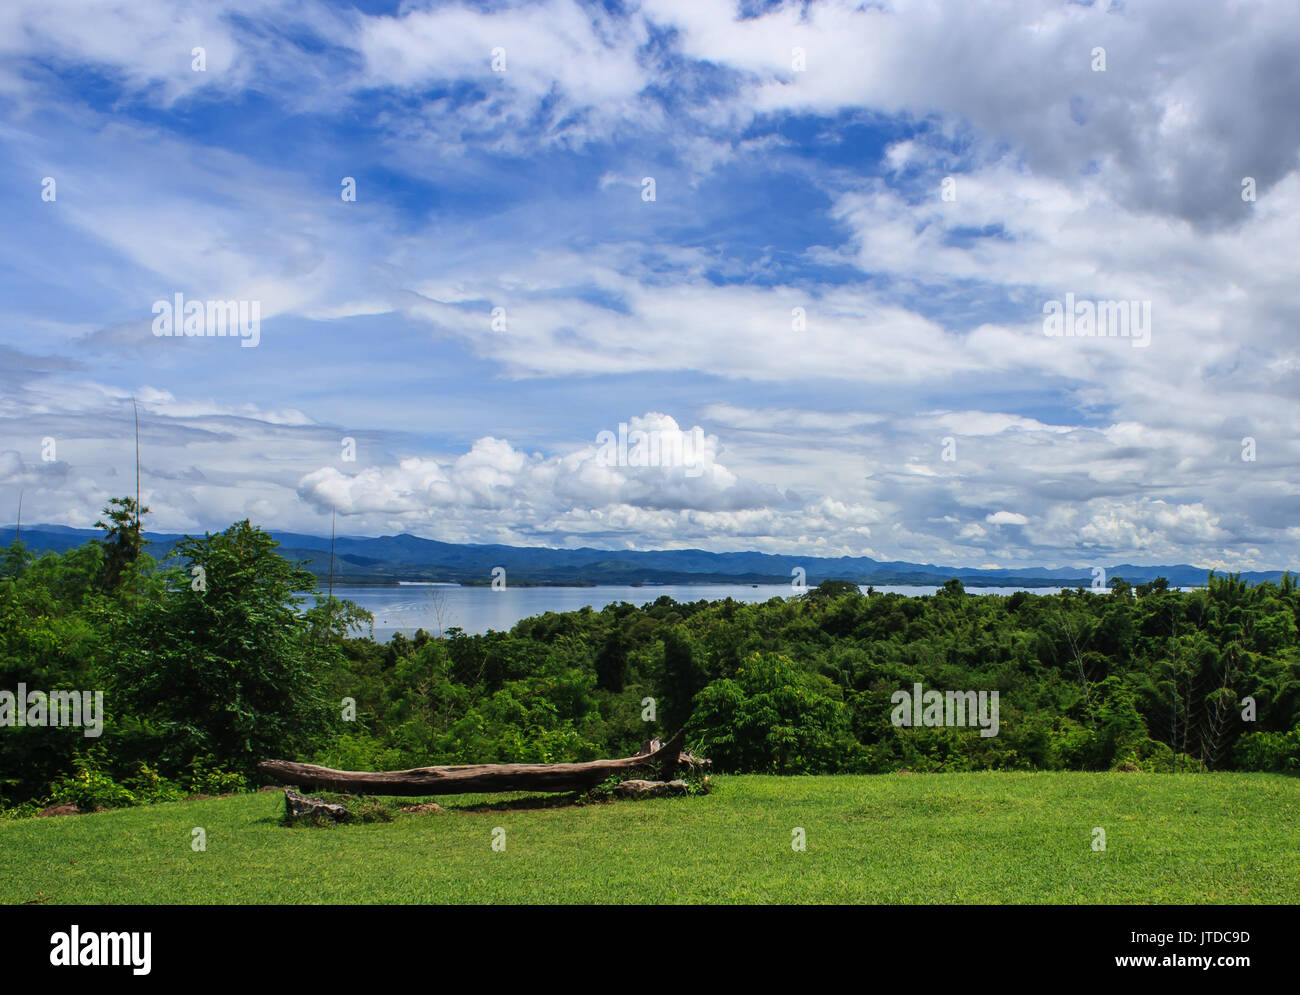 beautiful garden in front of blue Srinakarin dam with clear blue sky, Kanchanaburi province, Thailand - Stock Image